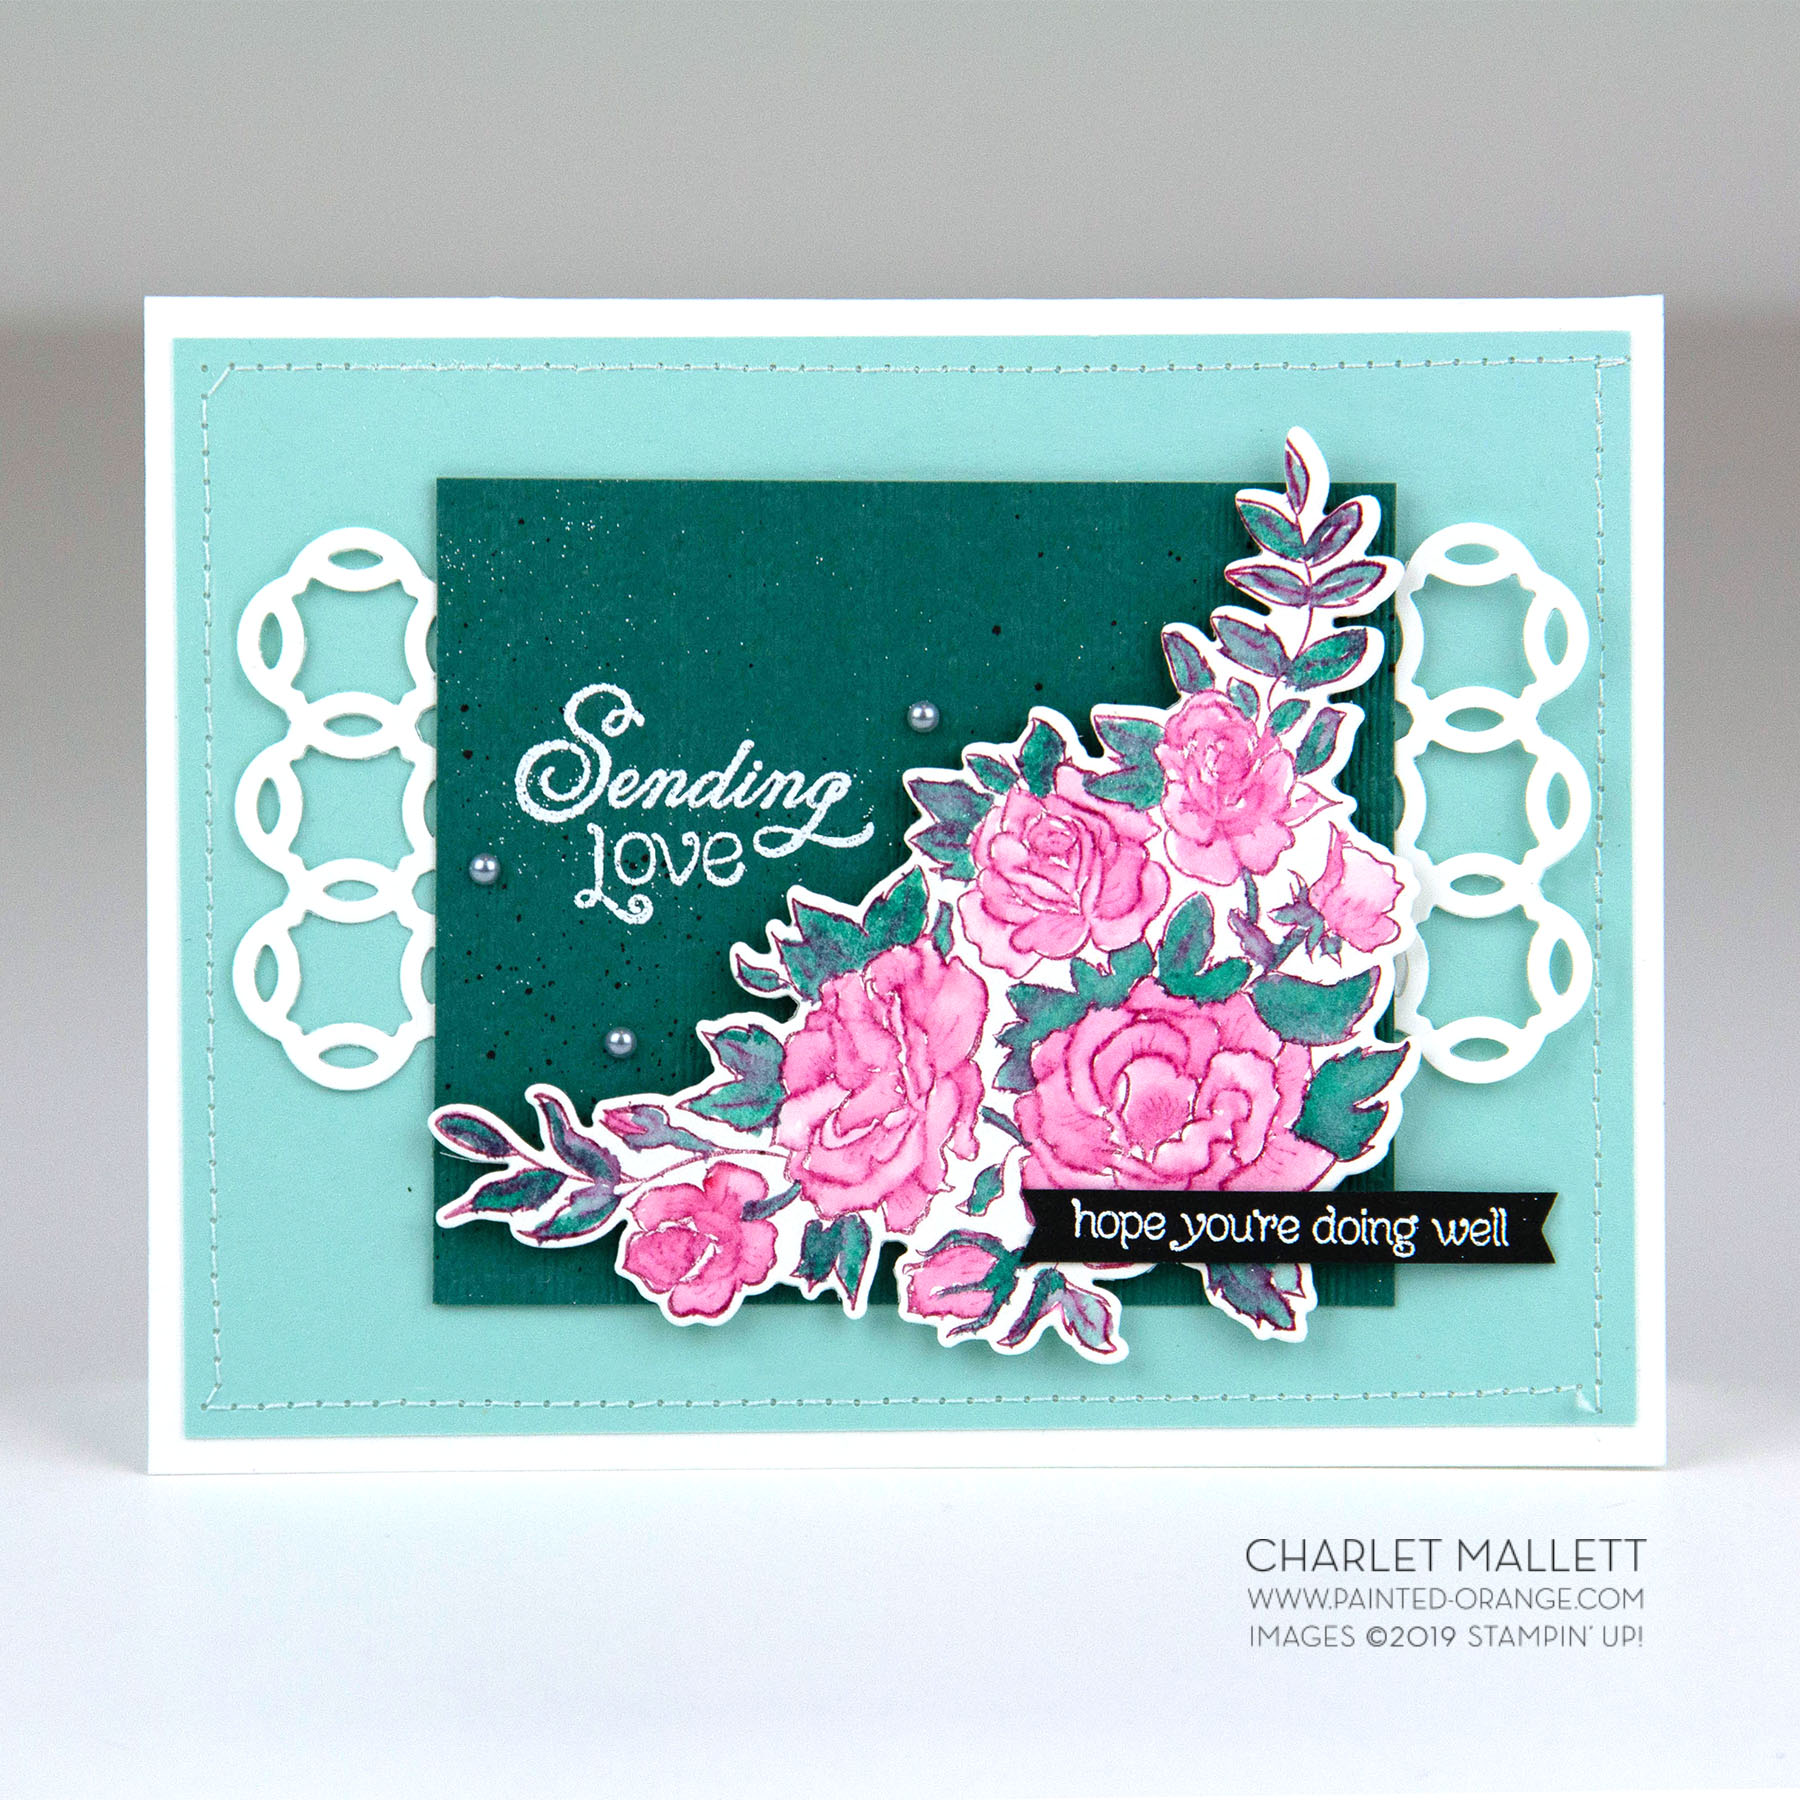 Climbing Roses Sympathy card - Charlet Mallett, Stampin' Up!